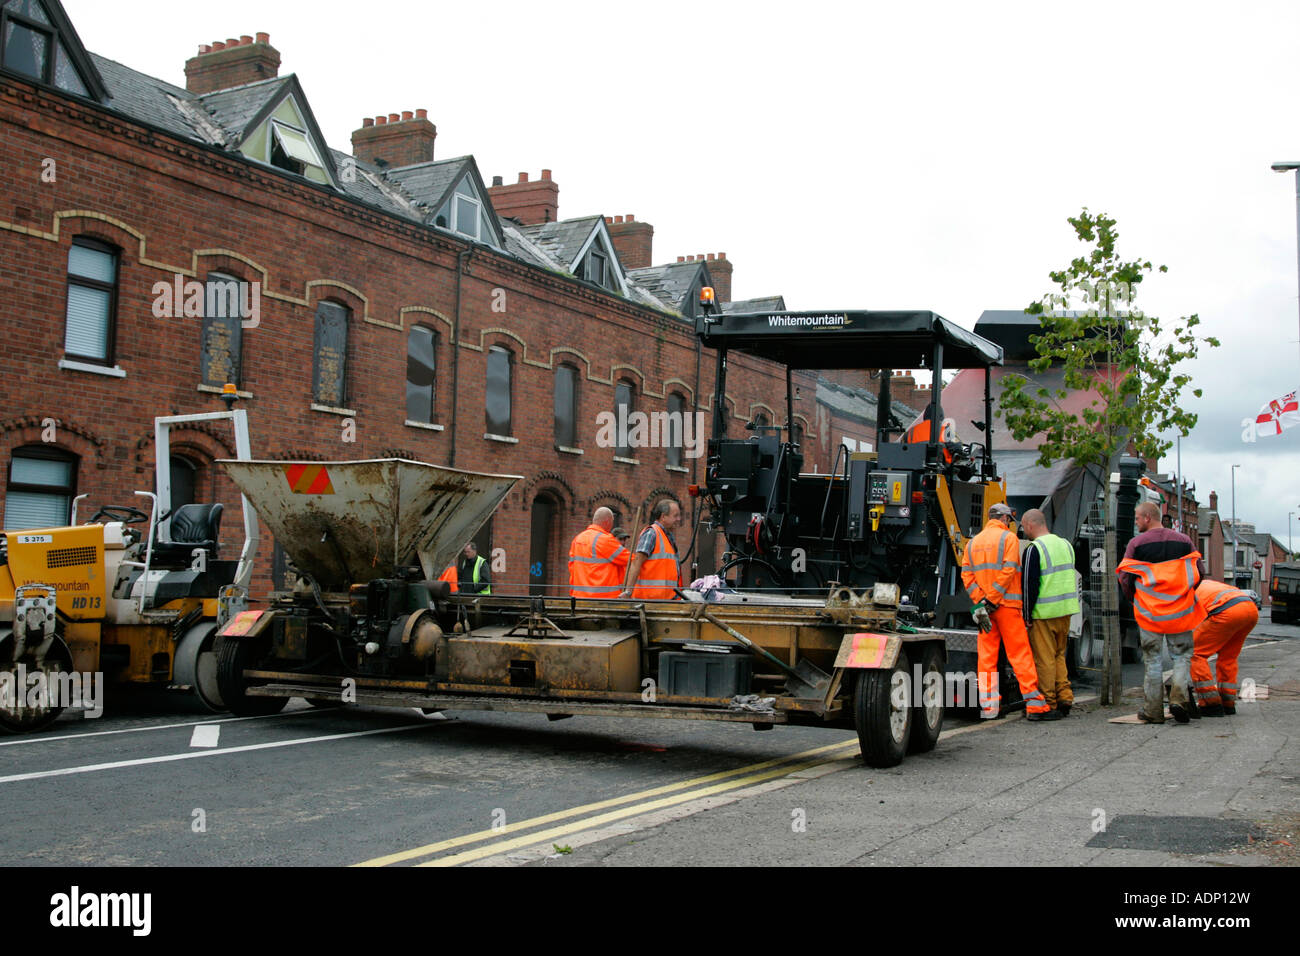 road resurfacing crew prepare equipment to resurface tarmac road in Belfast - Stock Image